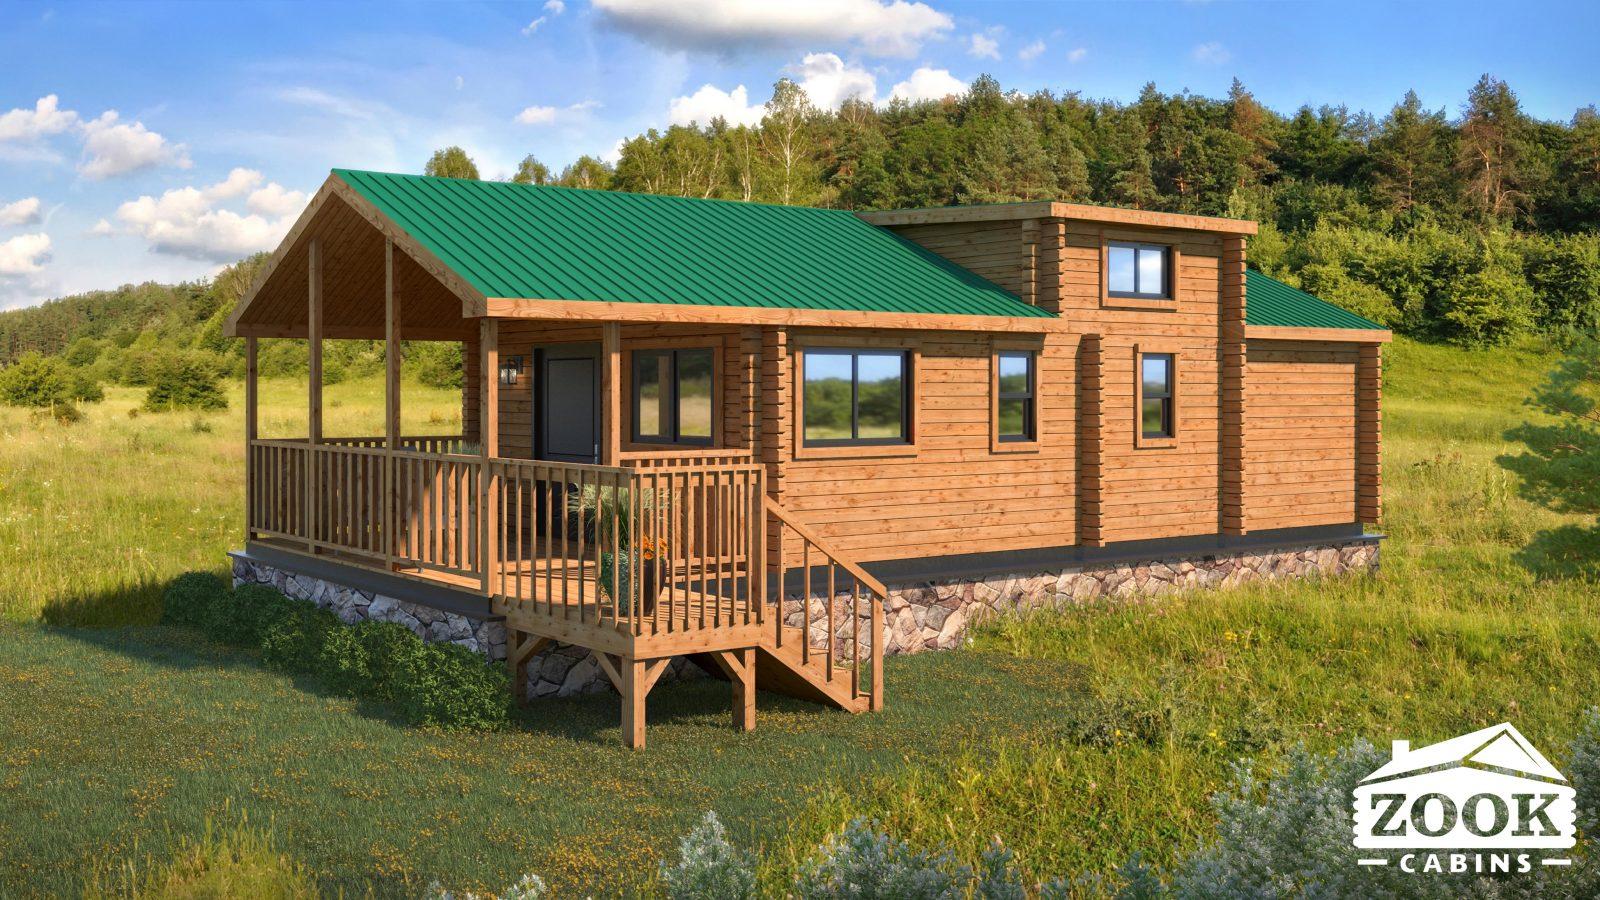 Sierra Park Model Home by Zook Models